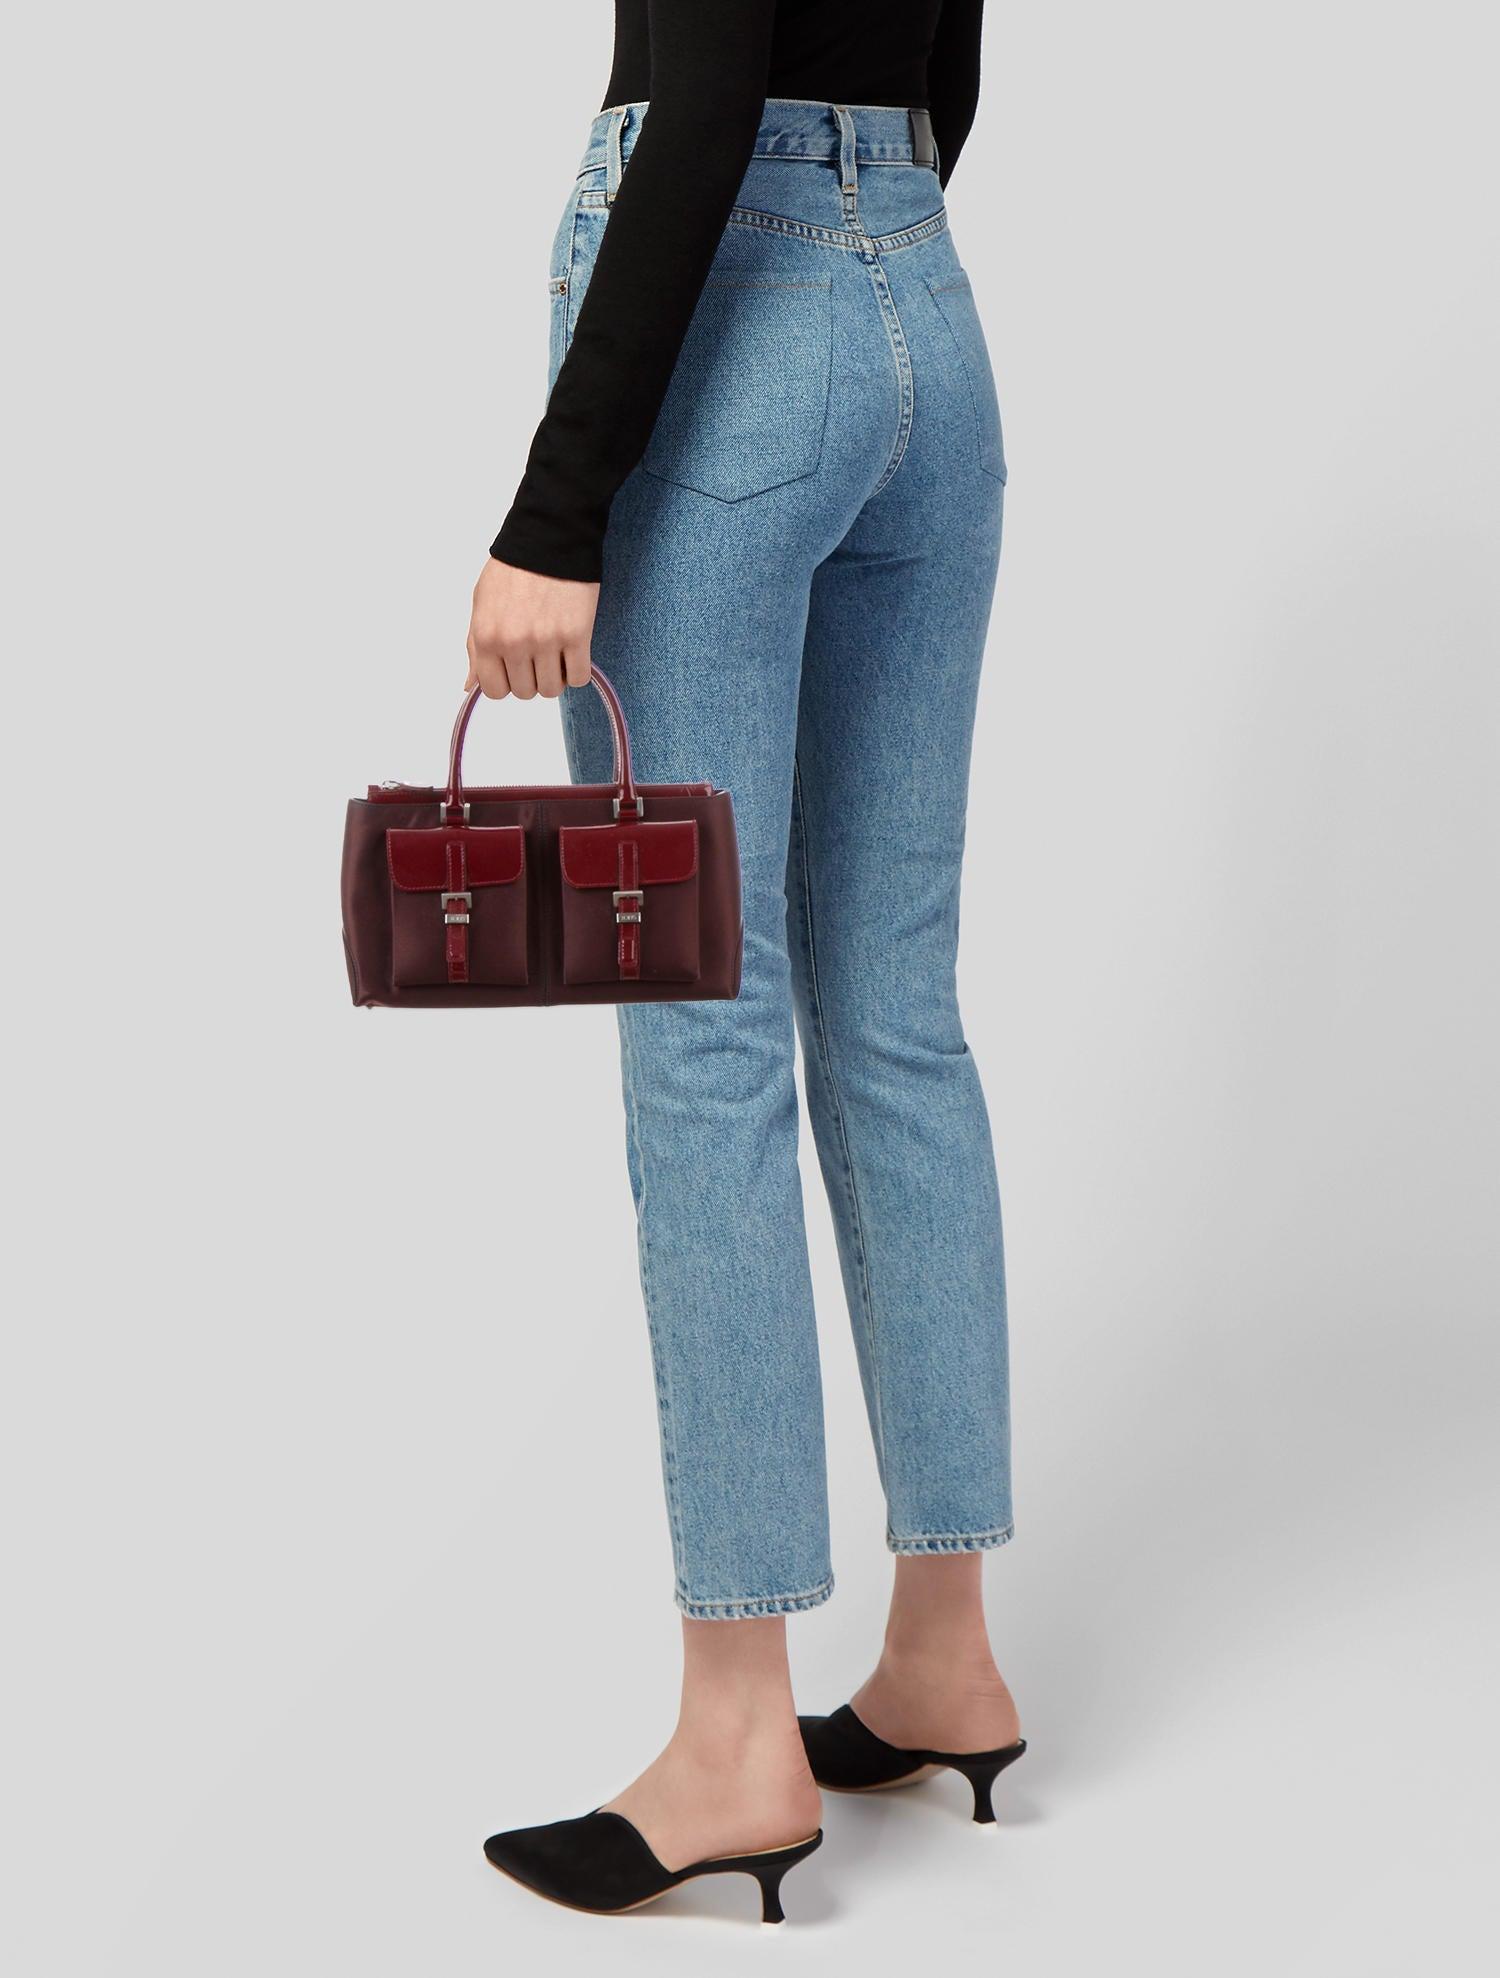 Tod\'s Small Handbag - Handbags - TOD51420 | The RealReal